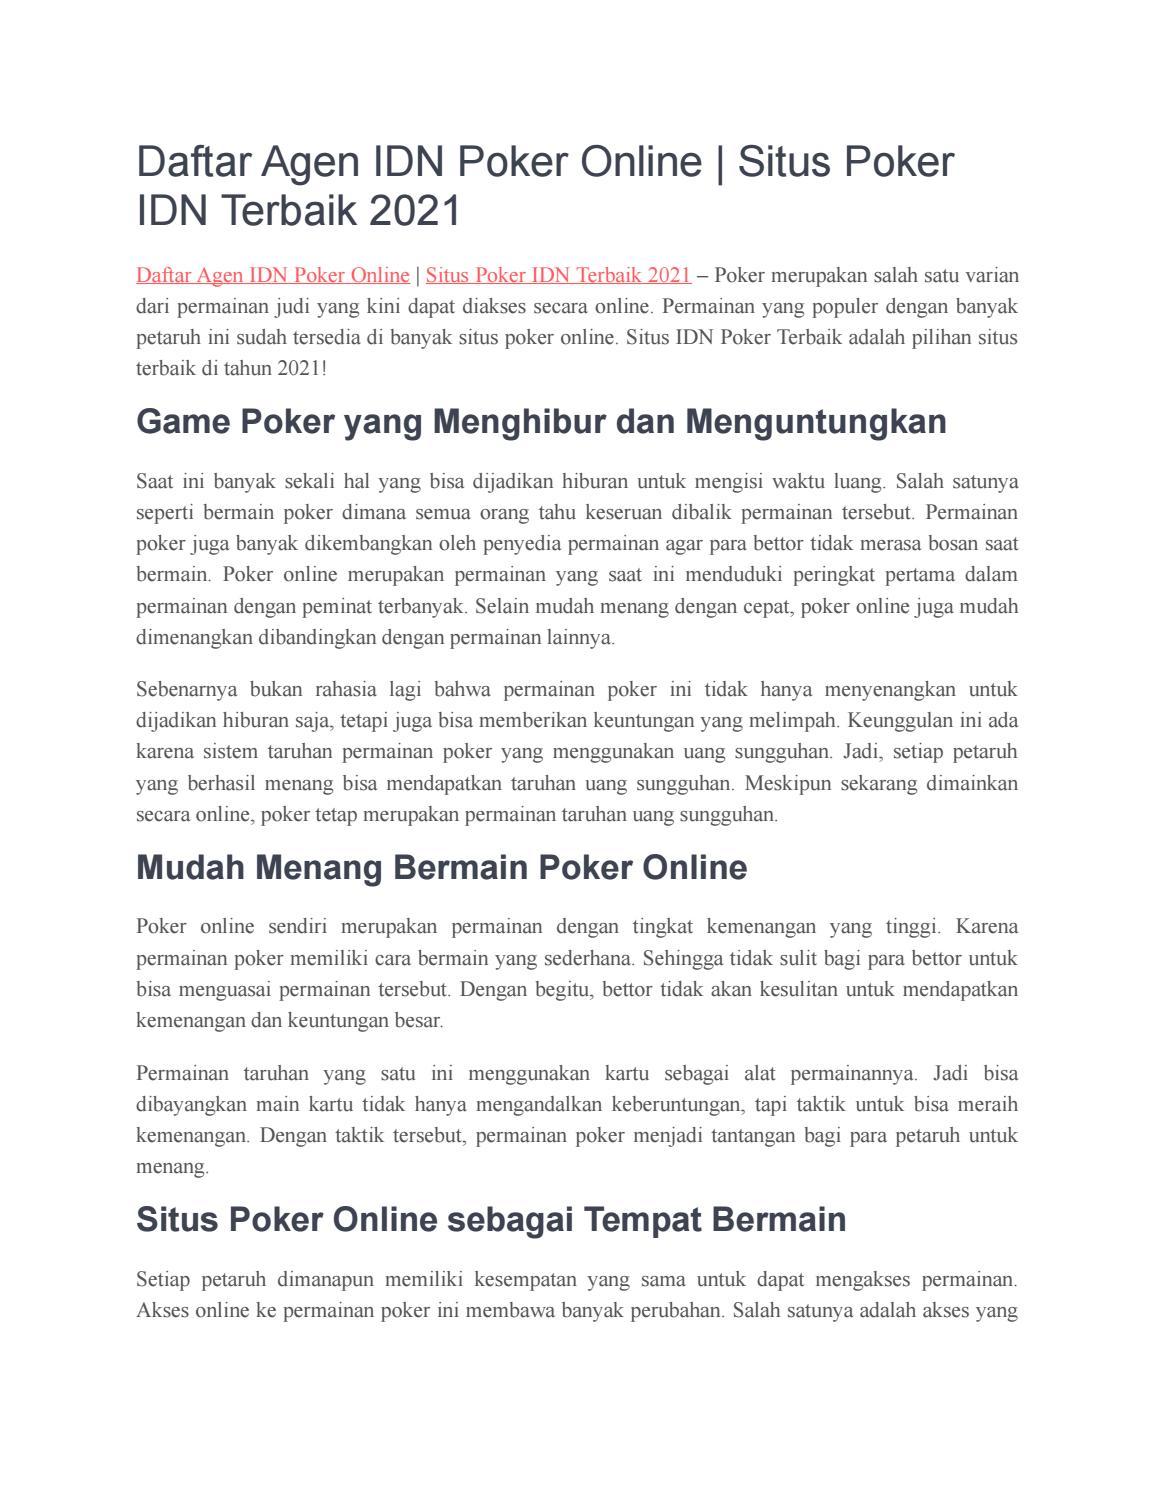 Daftar Agen Idn Poker Online Situs Poker Idn Terbaik 2021 By Aseppaku002 Issuu